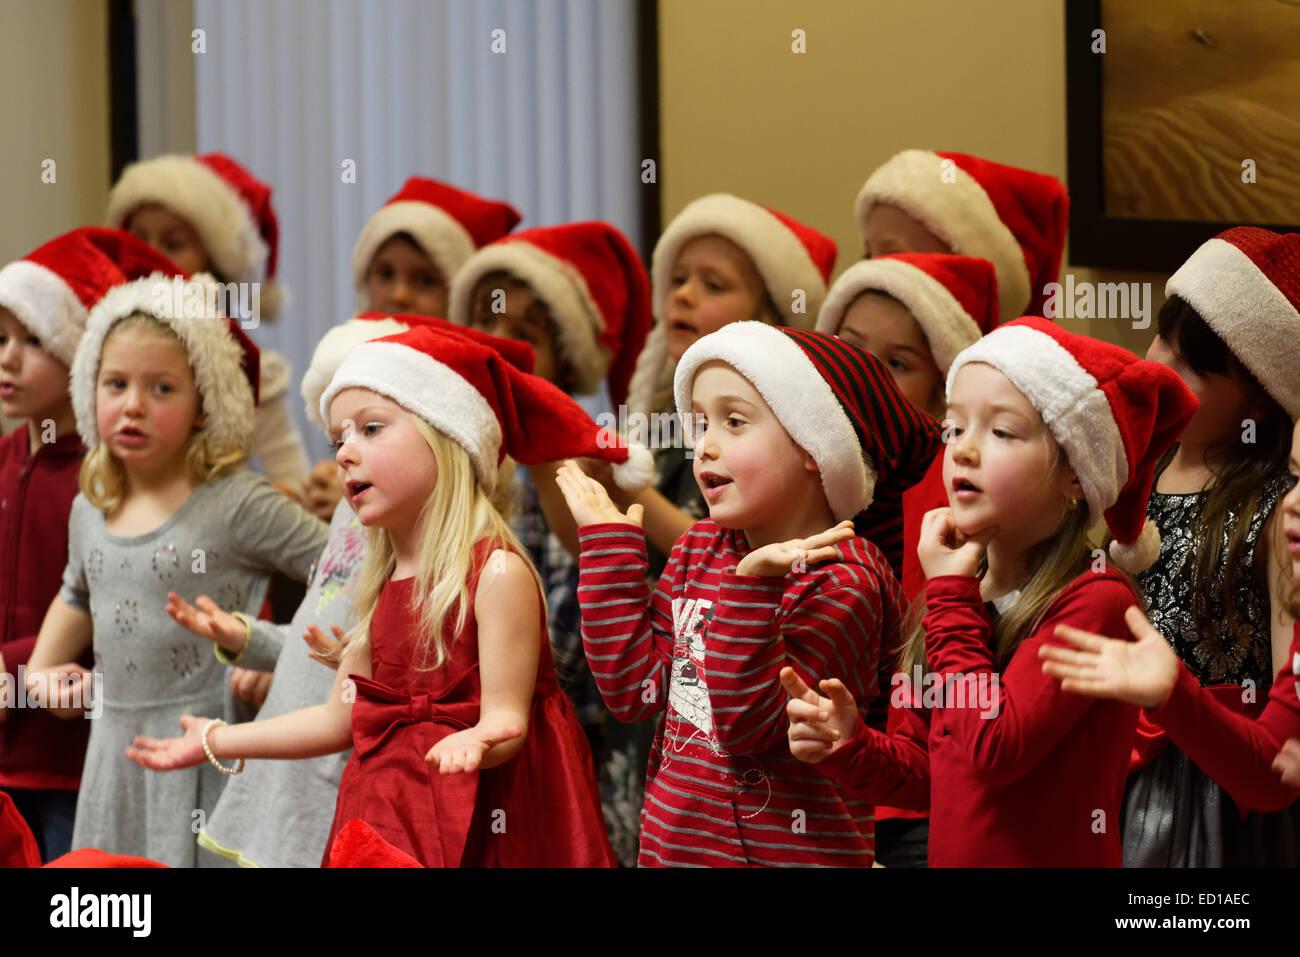 Children Singing Christmas Stock Photos & Children Singing Christmas ...